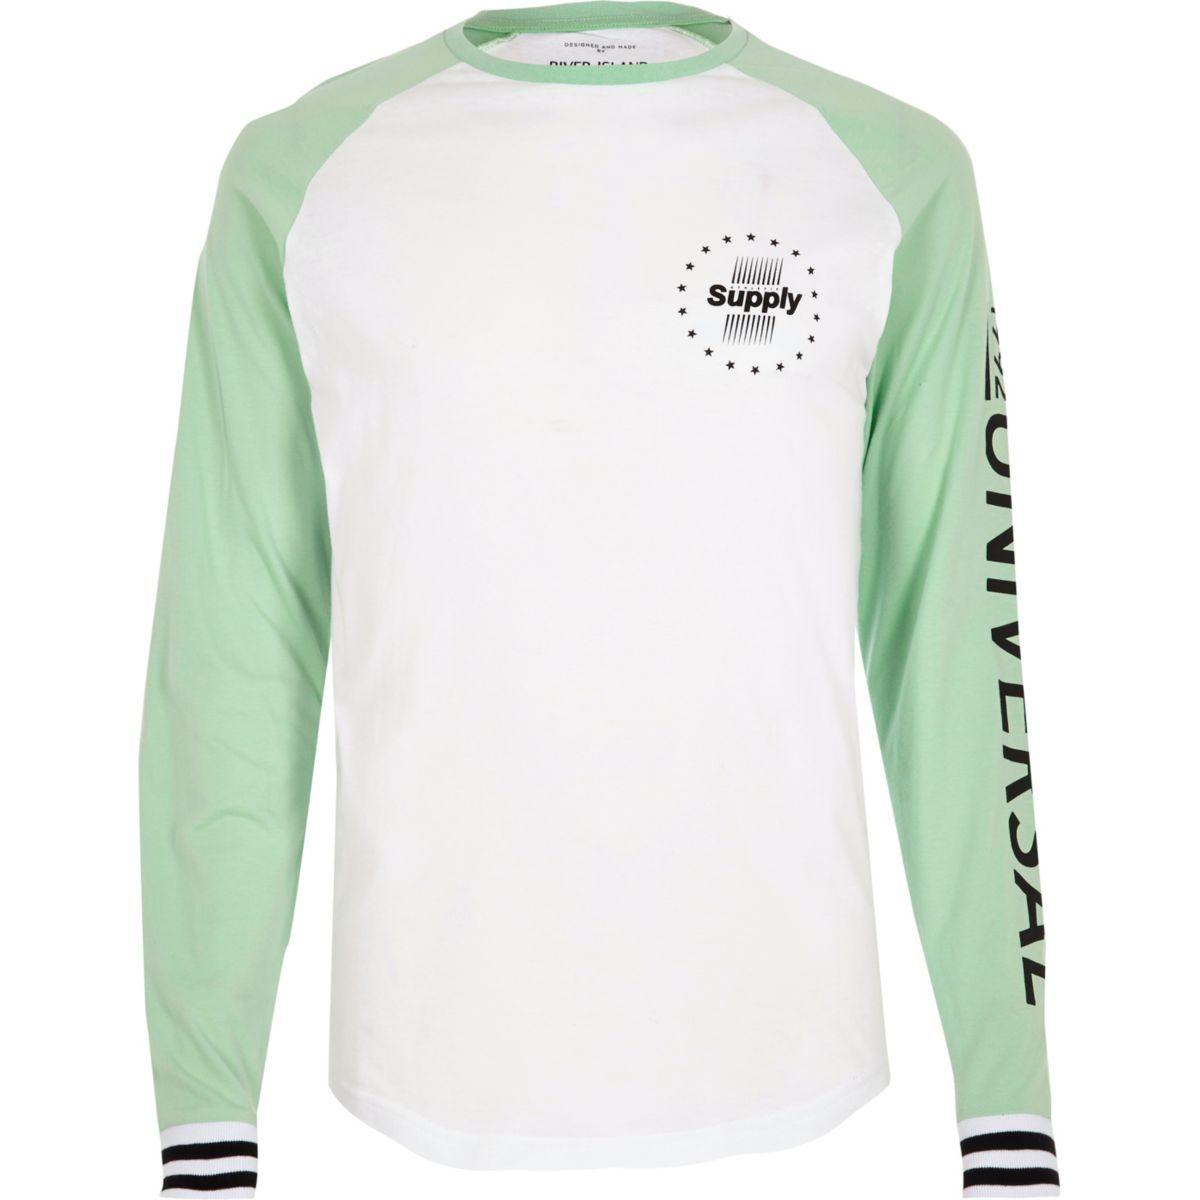 White and mint printed raglan sleeve T-shirt